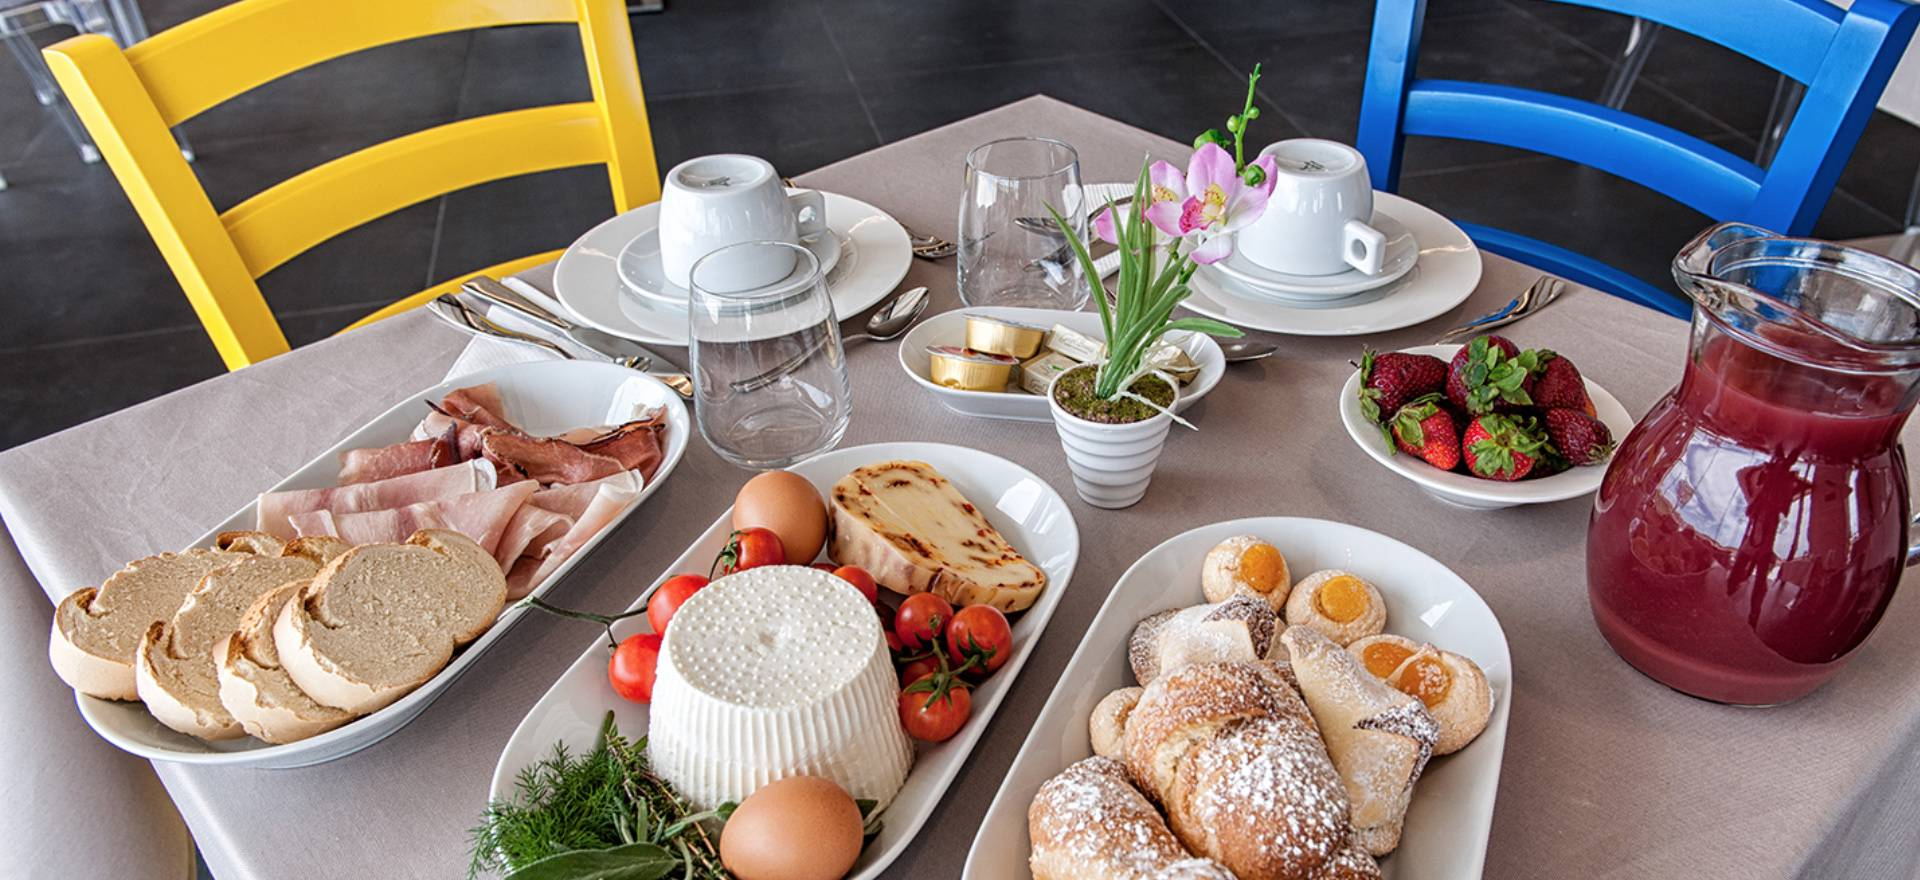 Agriturismo Sicily Restored agriturismo with good Sicilian restaurant